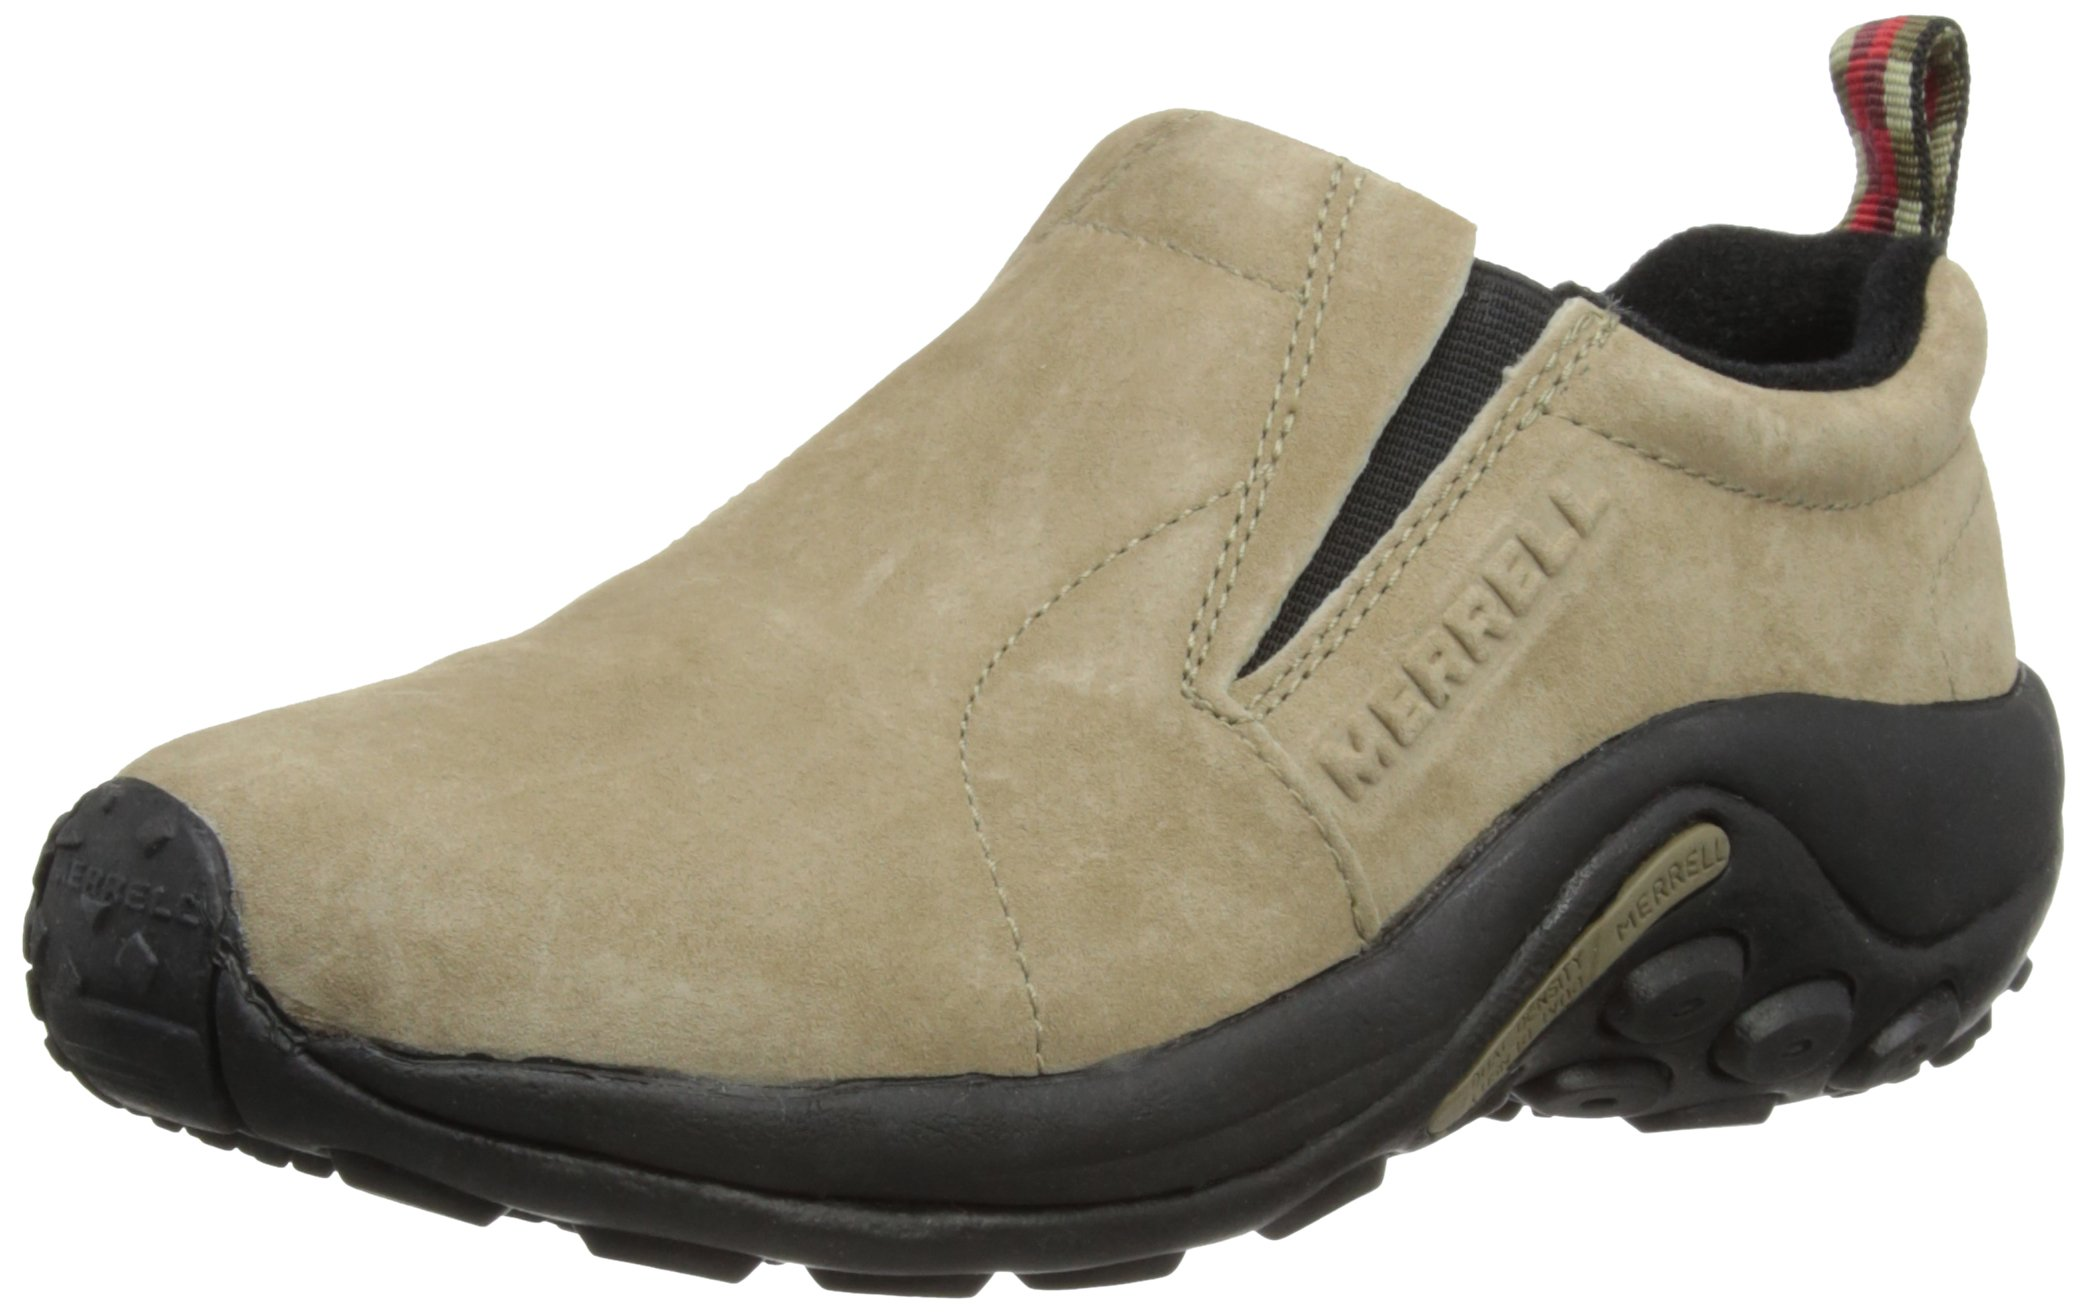 Merrell Women's Jungle Moc Taupe  Slip-On Shoe - 7.5 B(M) US